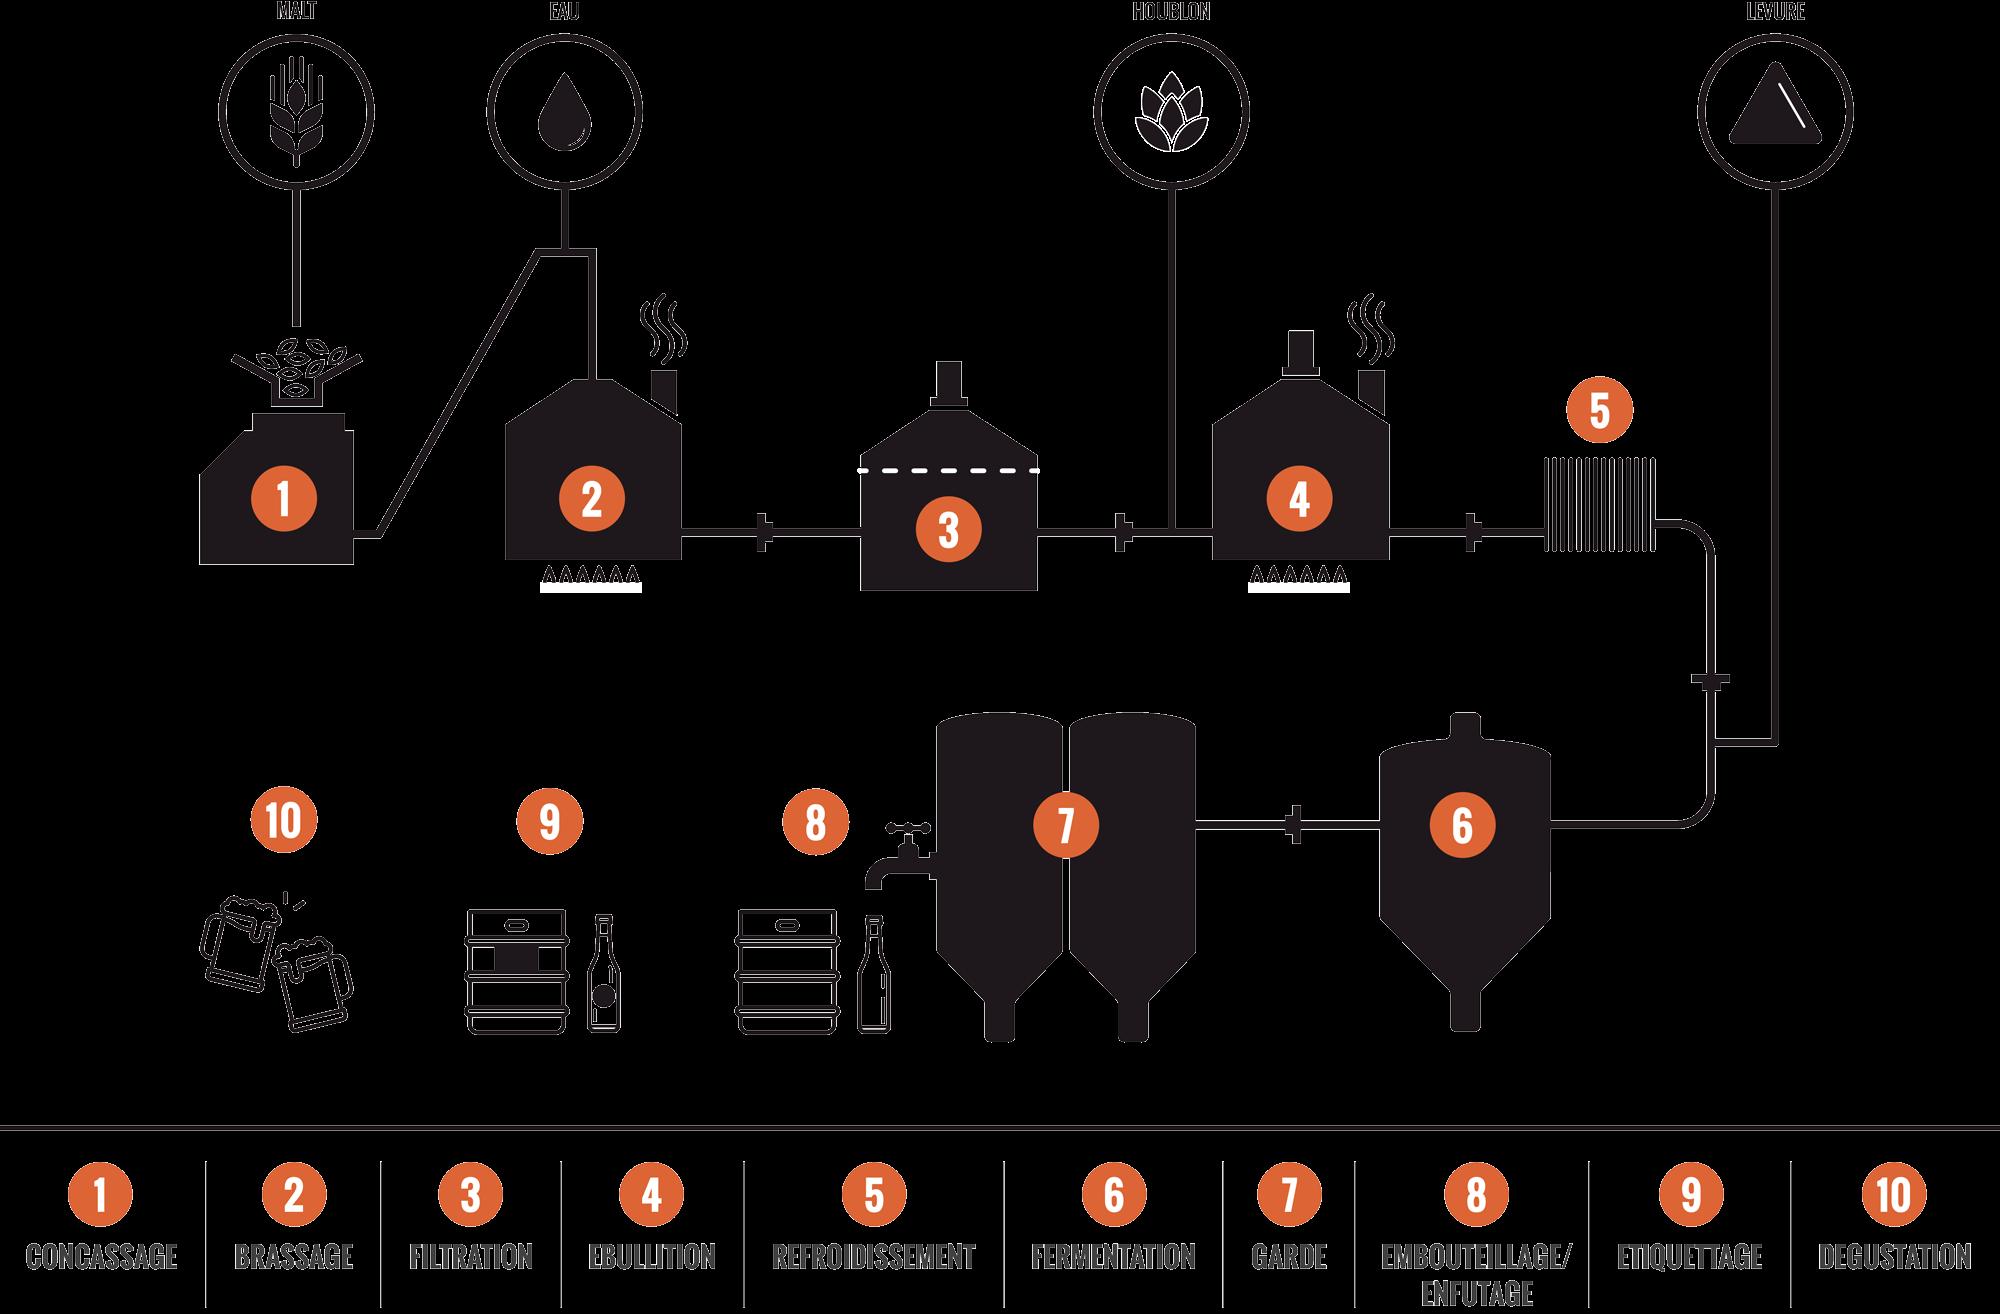 processus de brassage